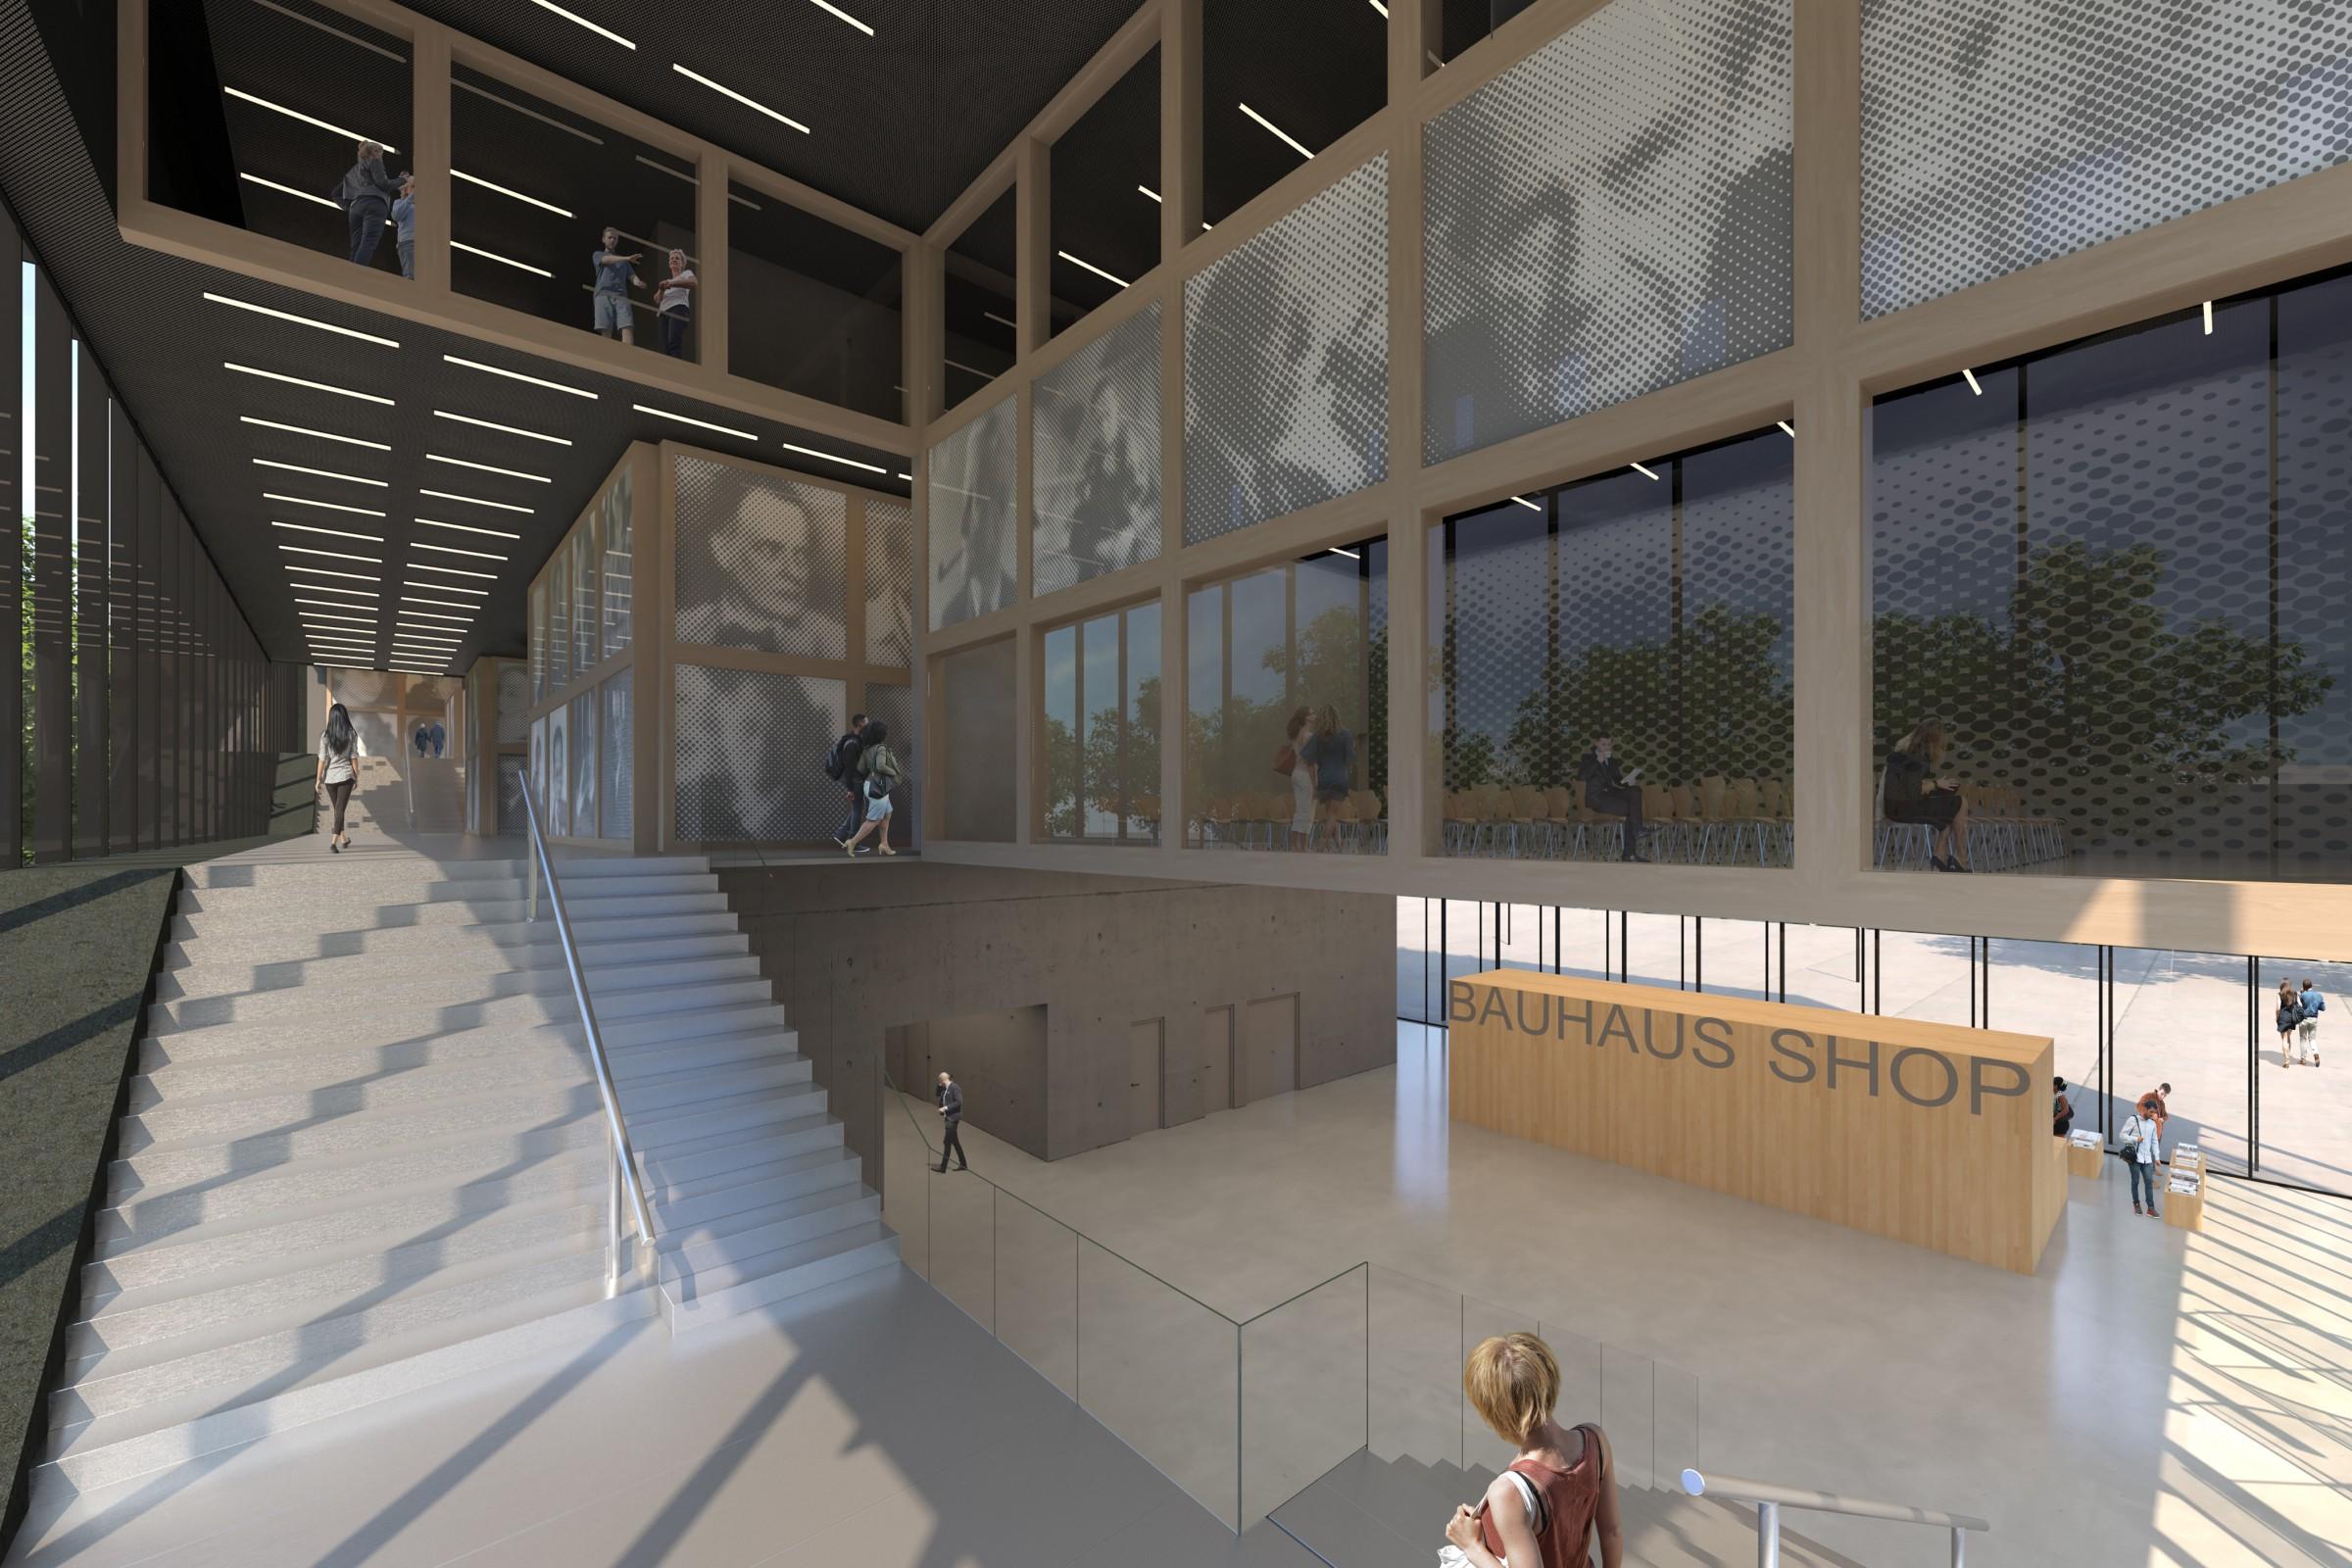 Architect_museum_Bauhaus_modern_1